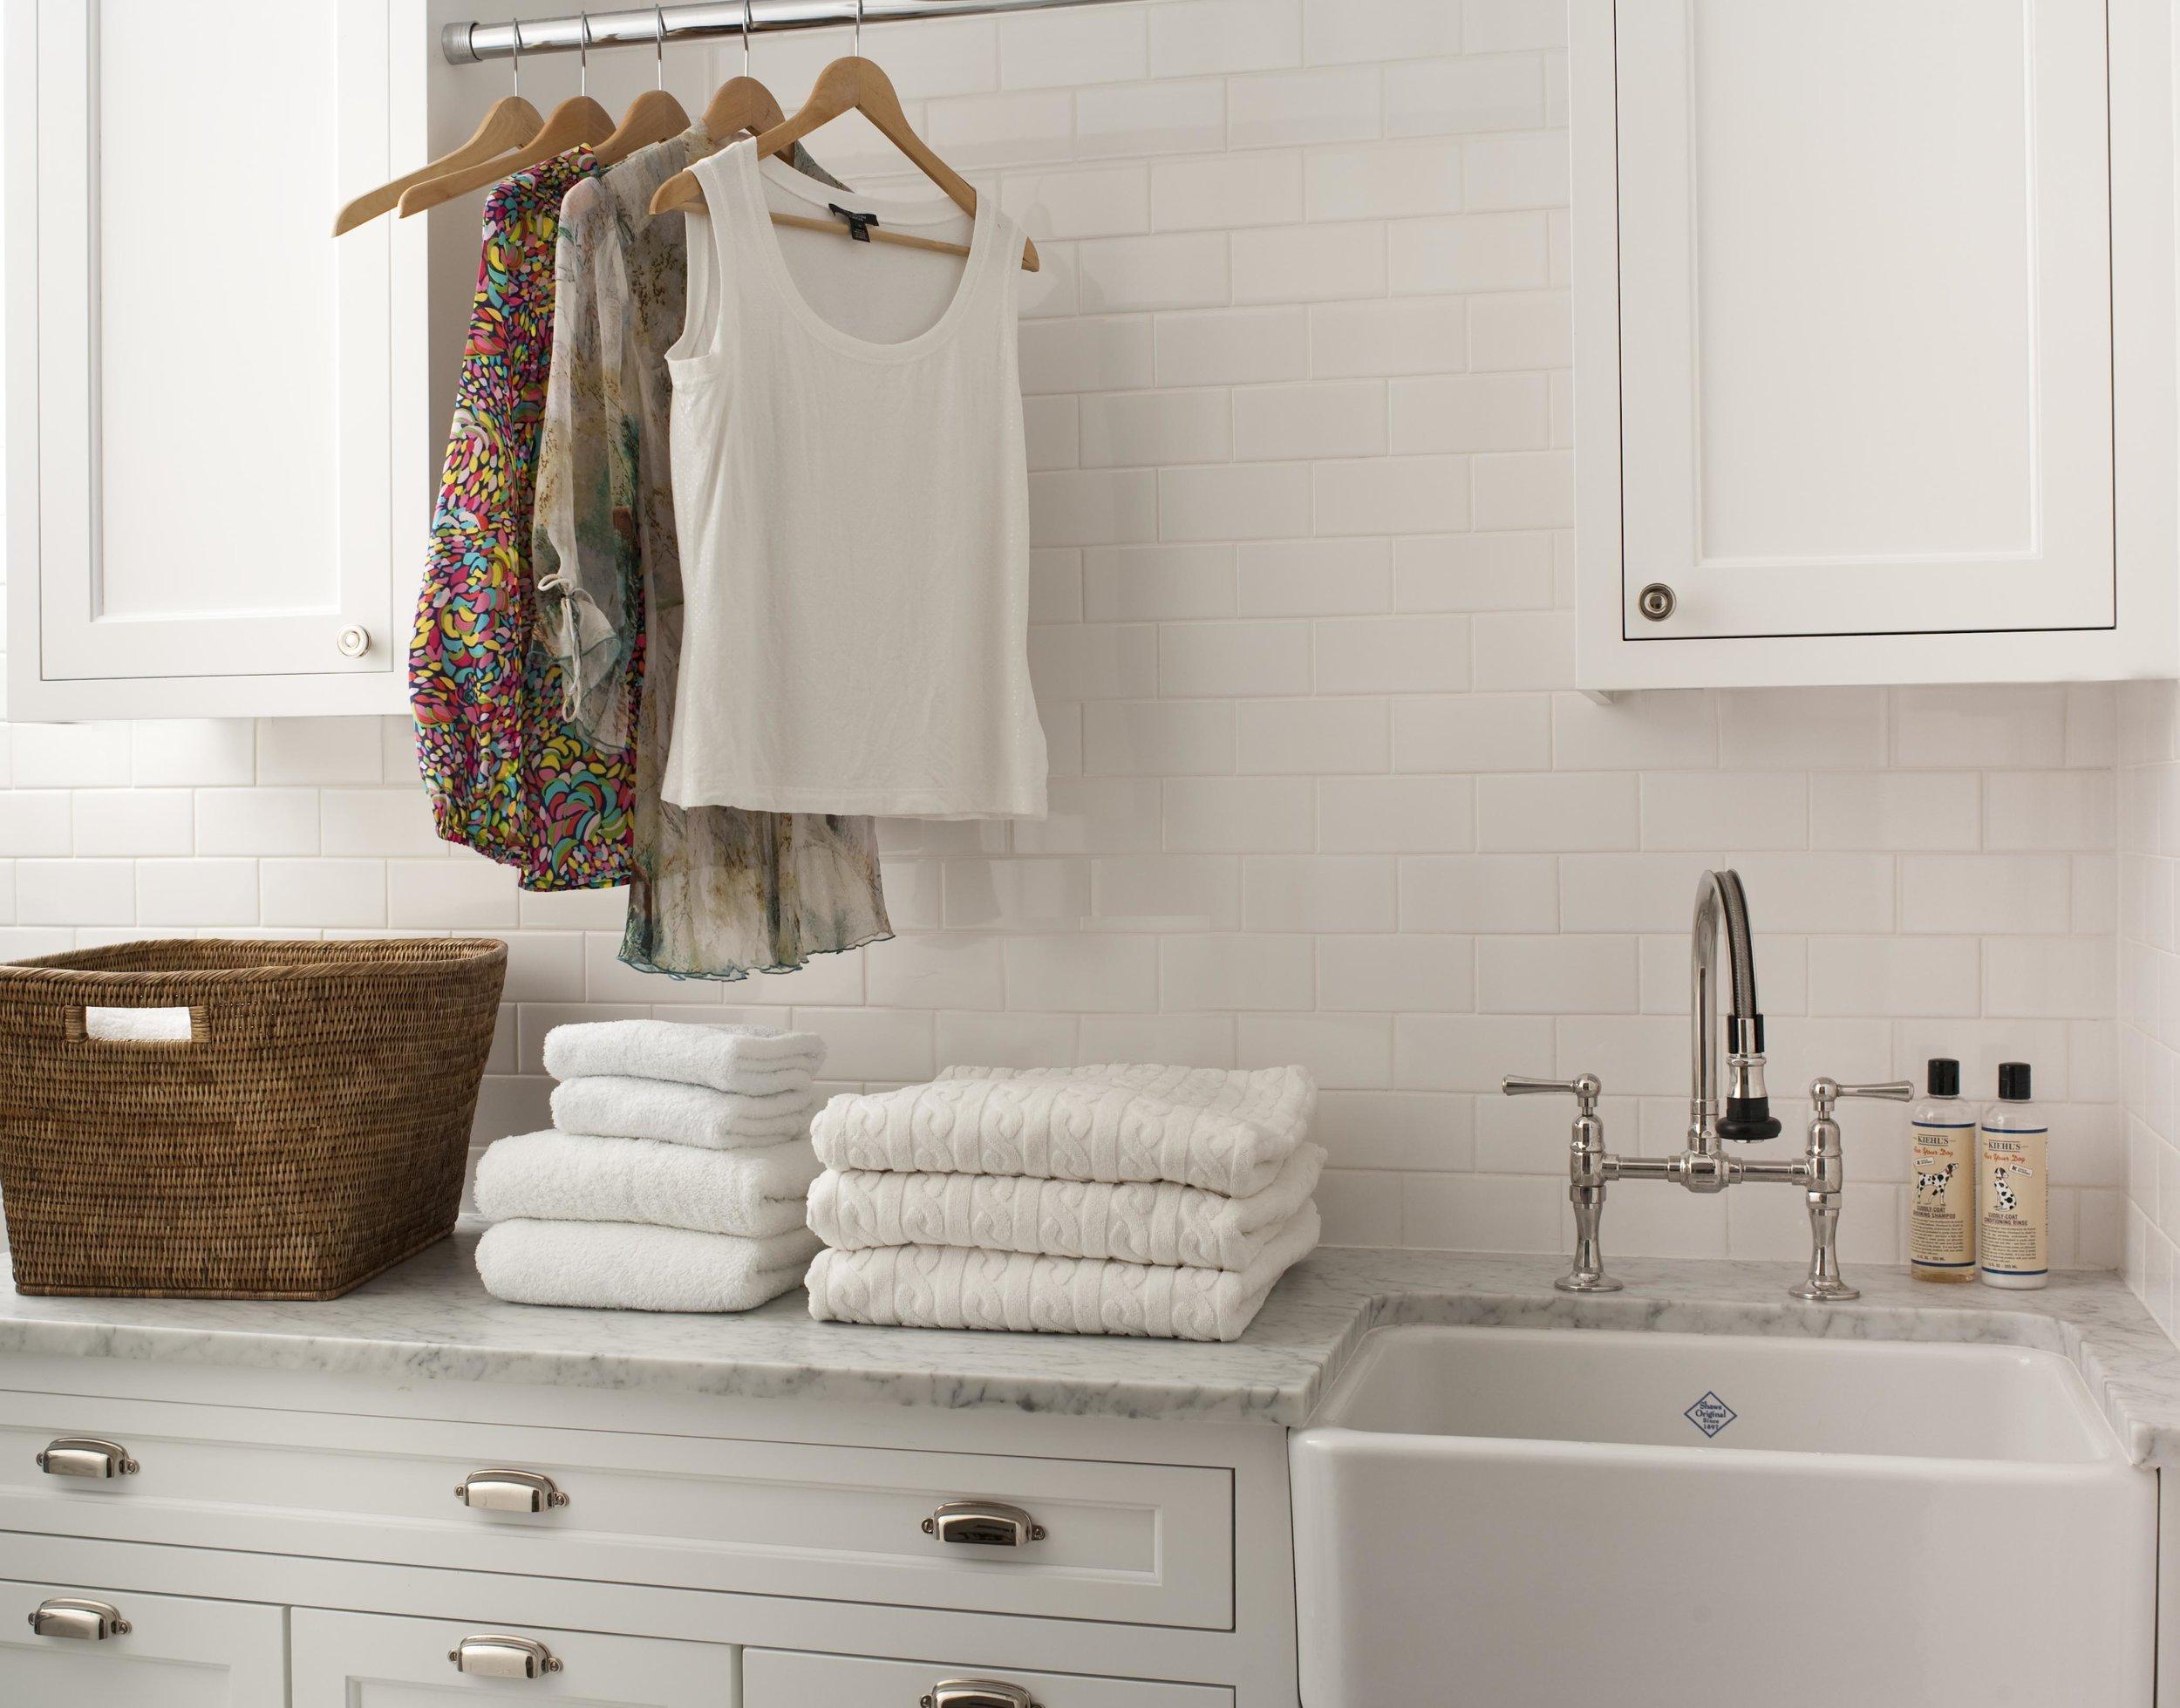 N-LaundryRoom_0573R.jpg